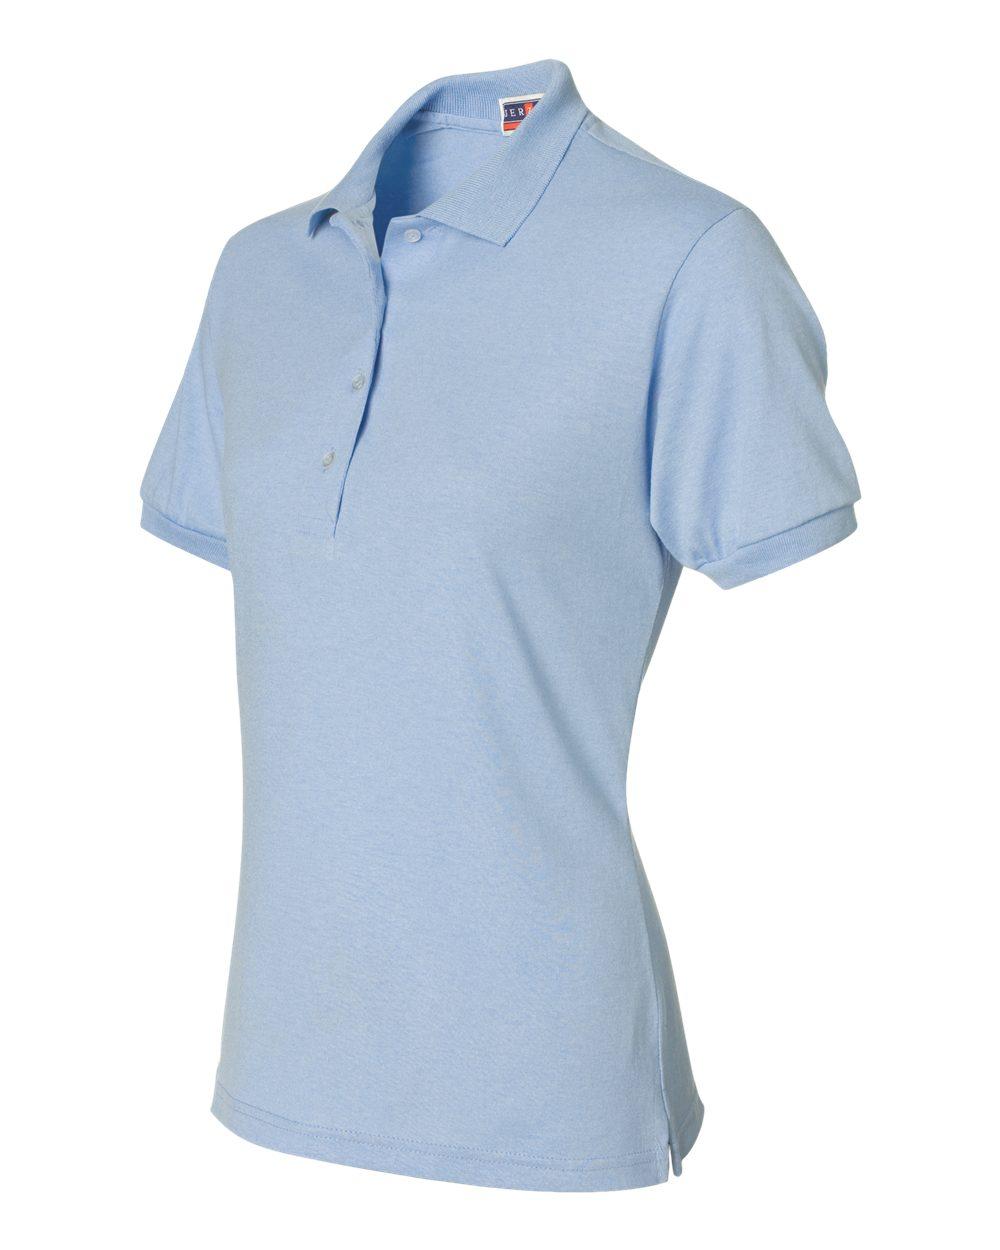 Jerzees-Womens-5-6-oz-50-50-Jersey-Polo-with-Spot-Shield-437W-Size-S-2XL thumbnail 40